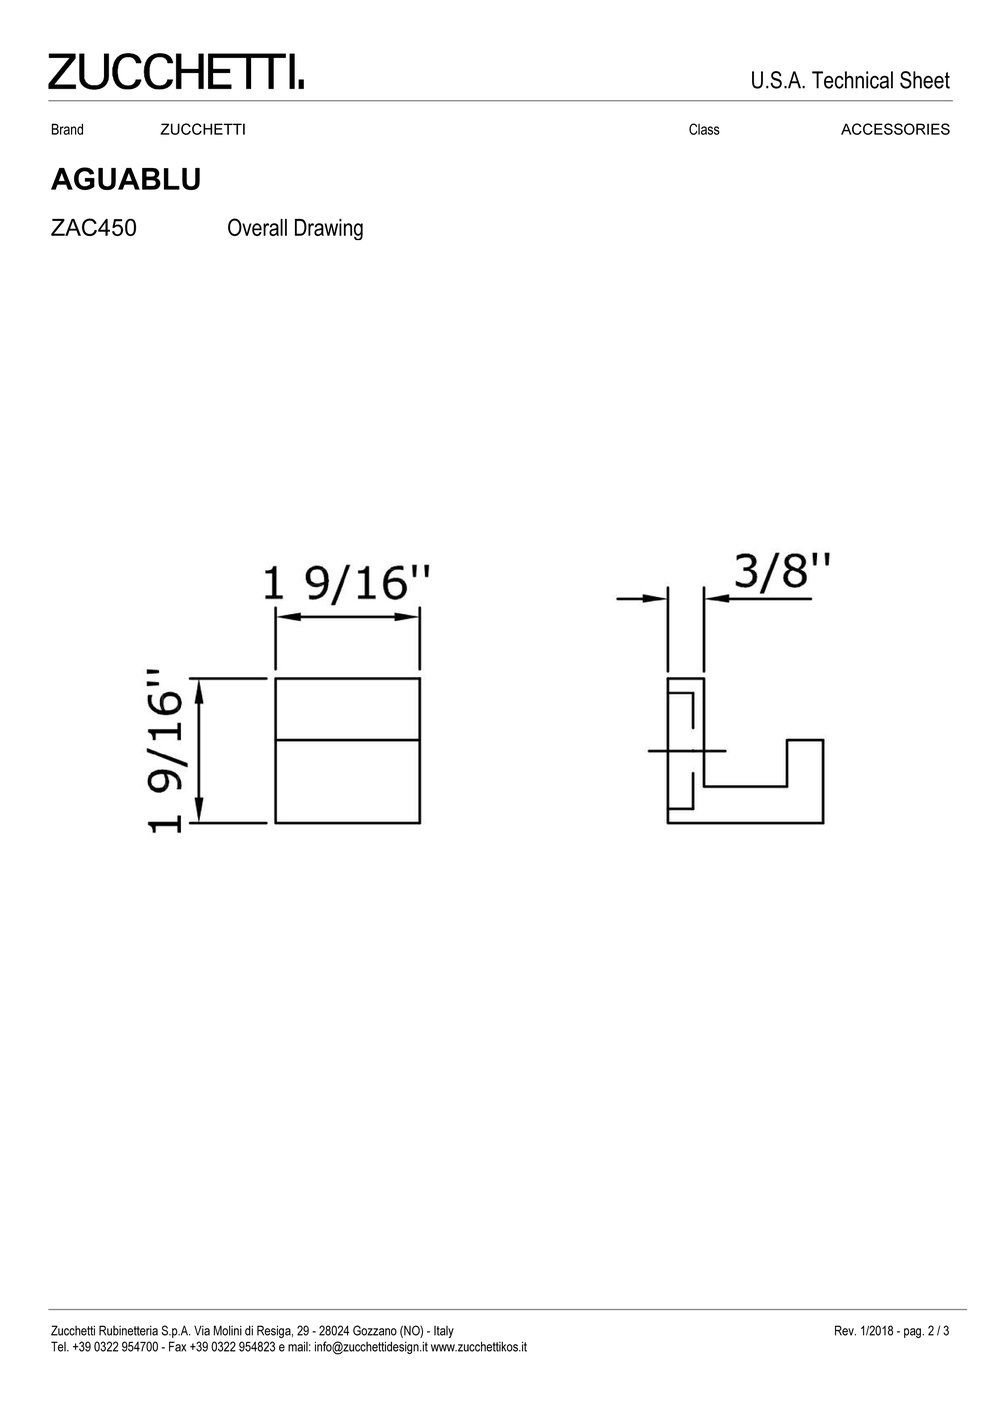 Zuchetti Aquablu robe hook, 3,9 w x 3,9 h, PC-2.jpg